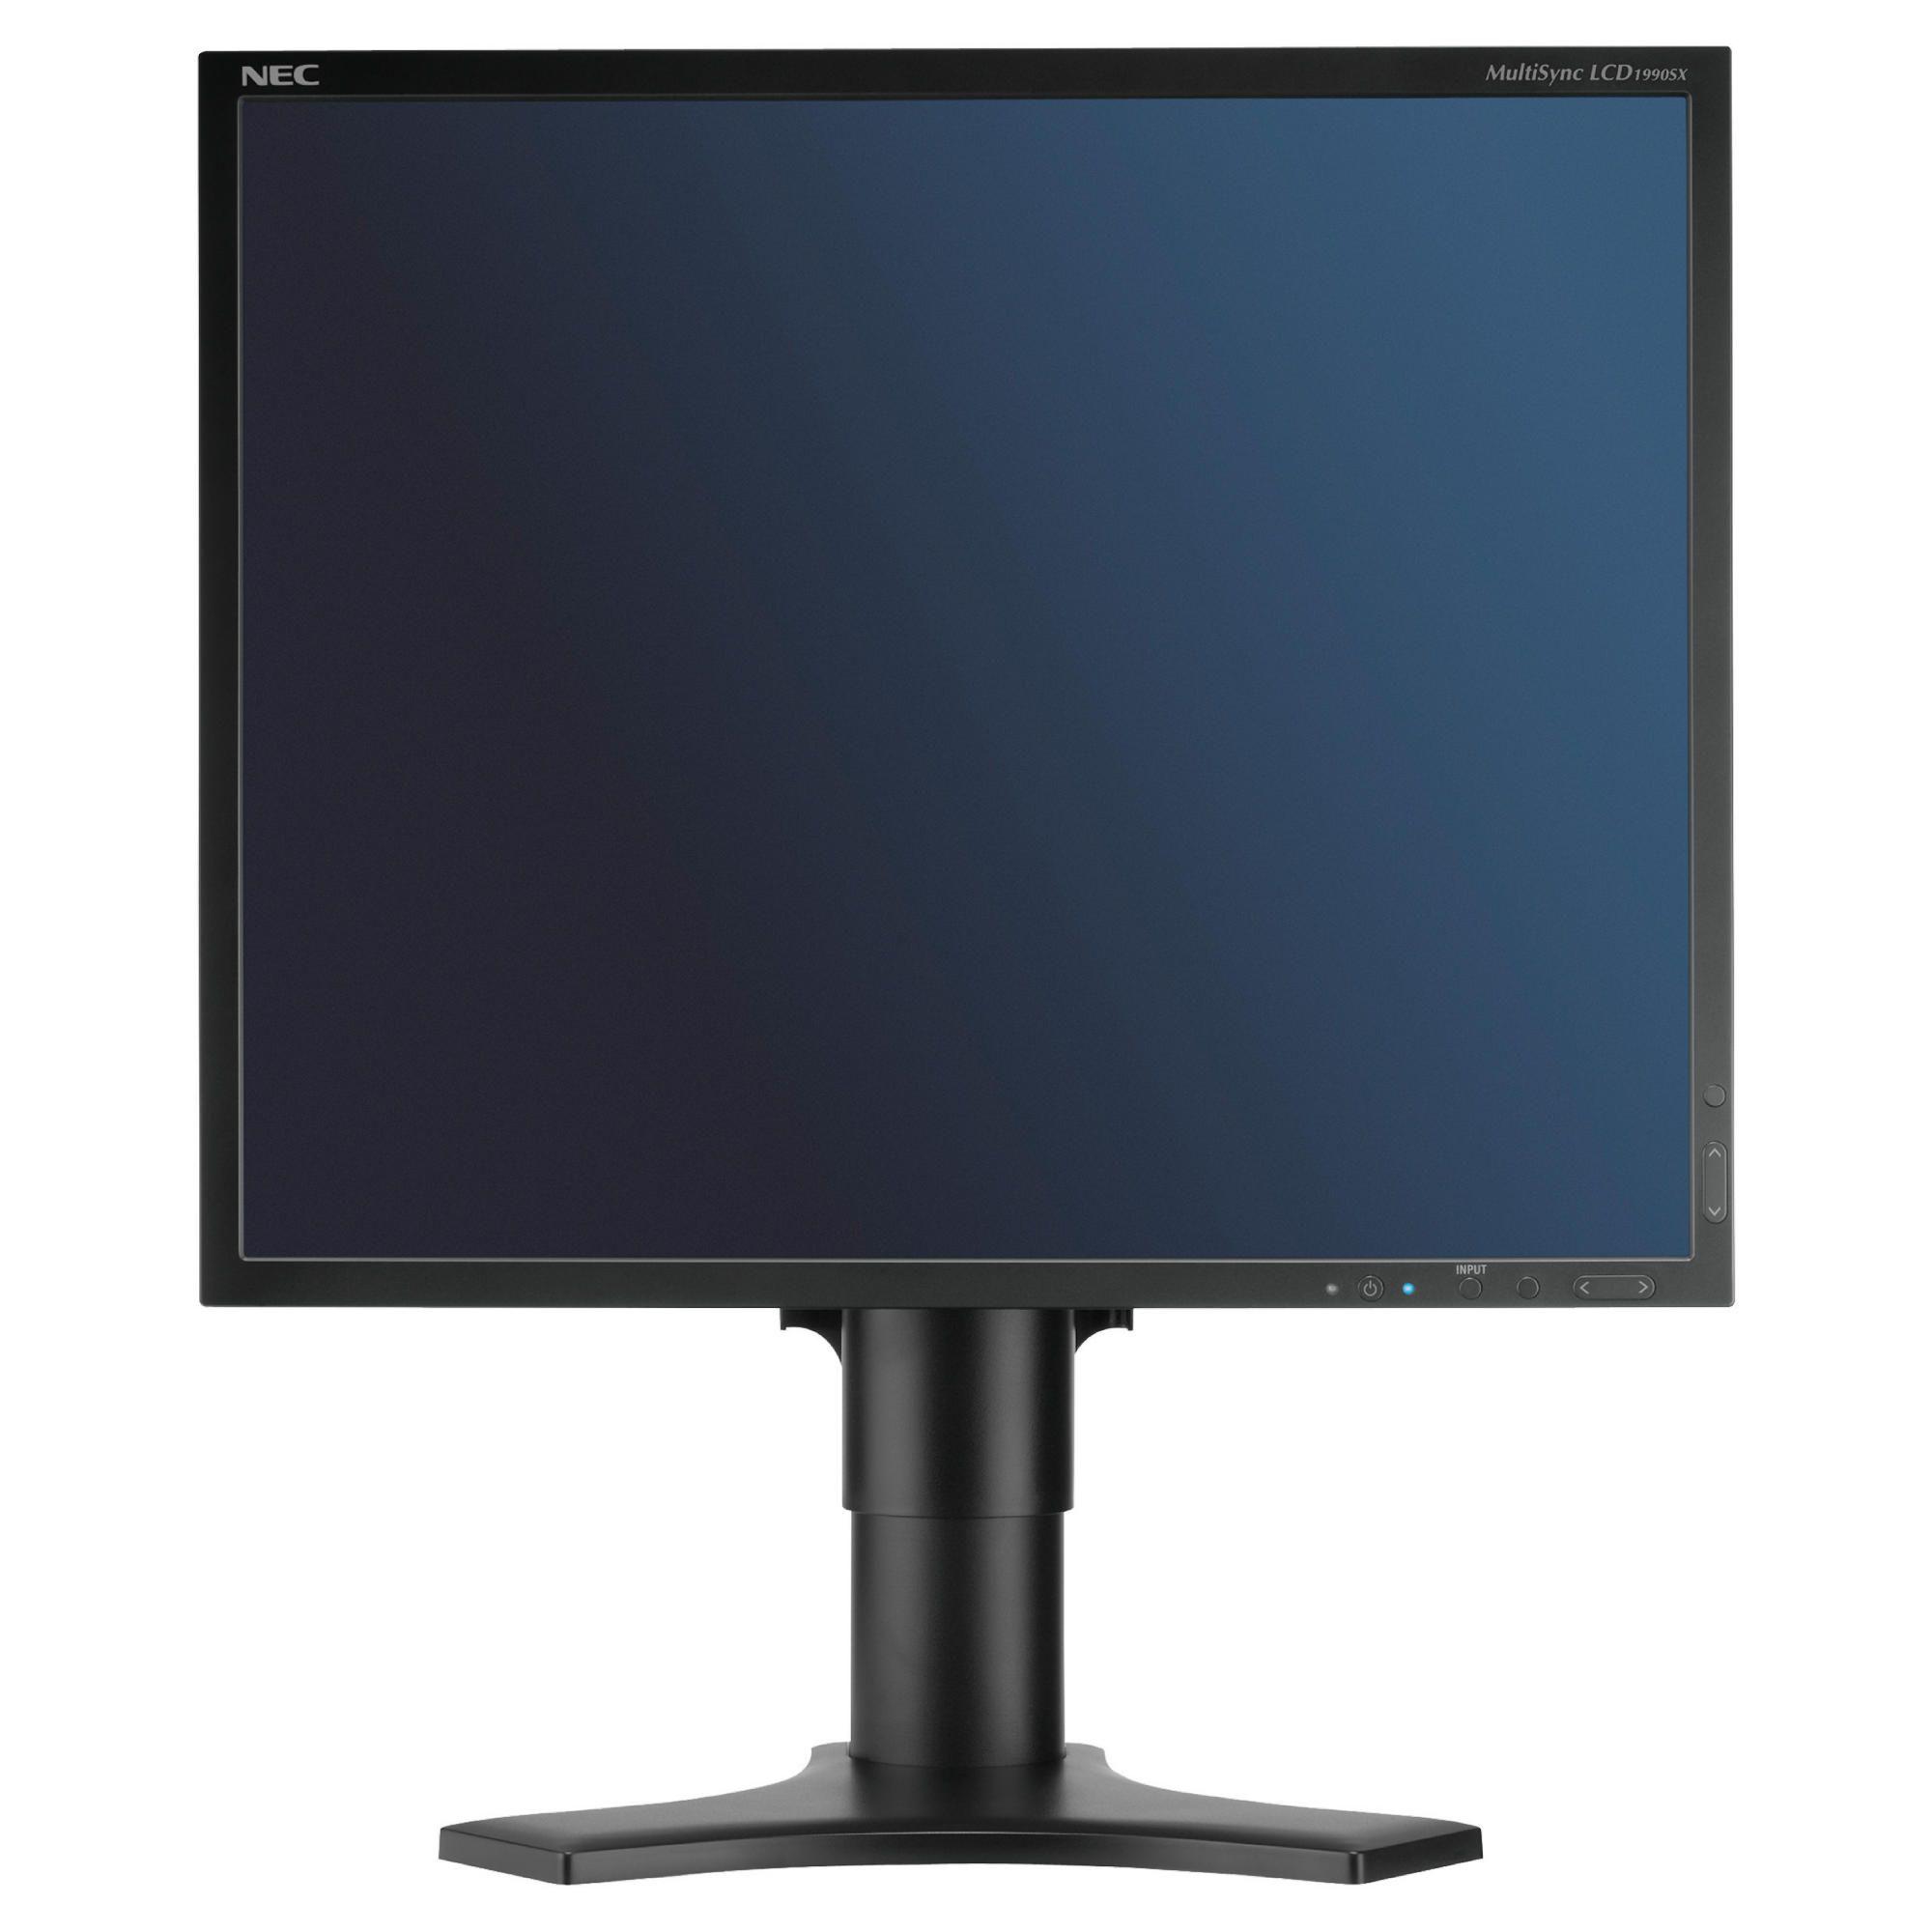 NEC 1990SXB 19'' LCD Monitor Black at Tesco Direct